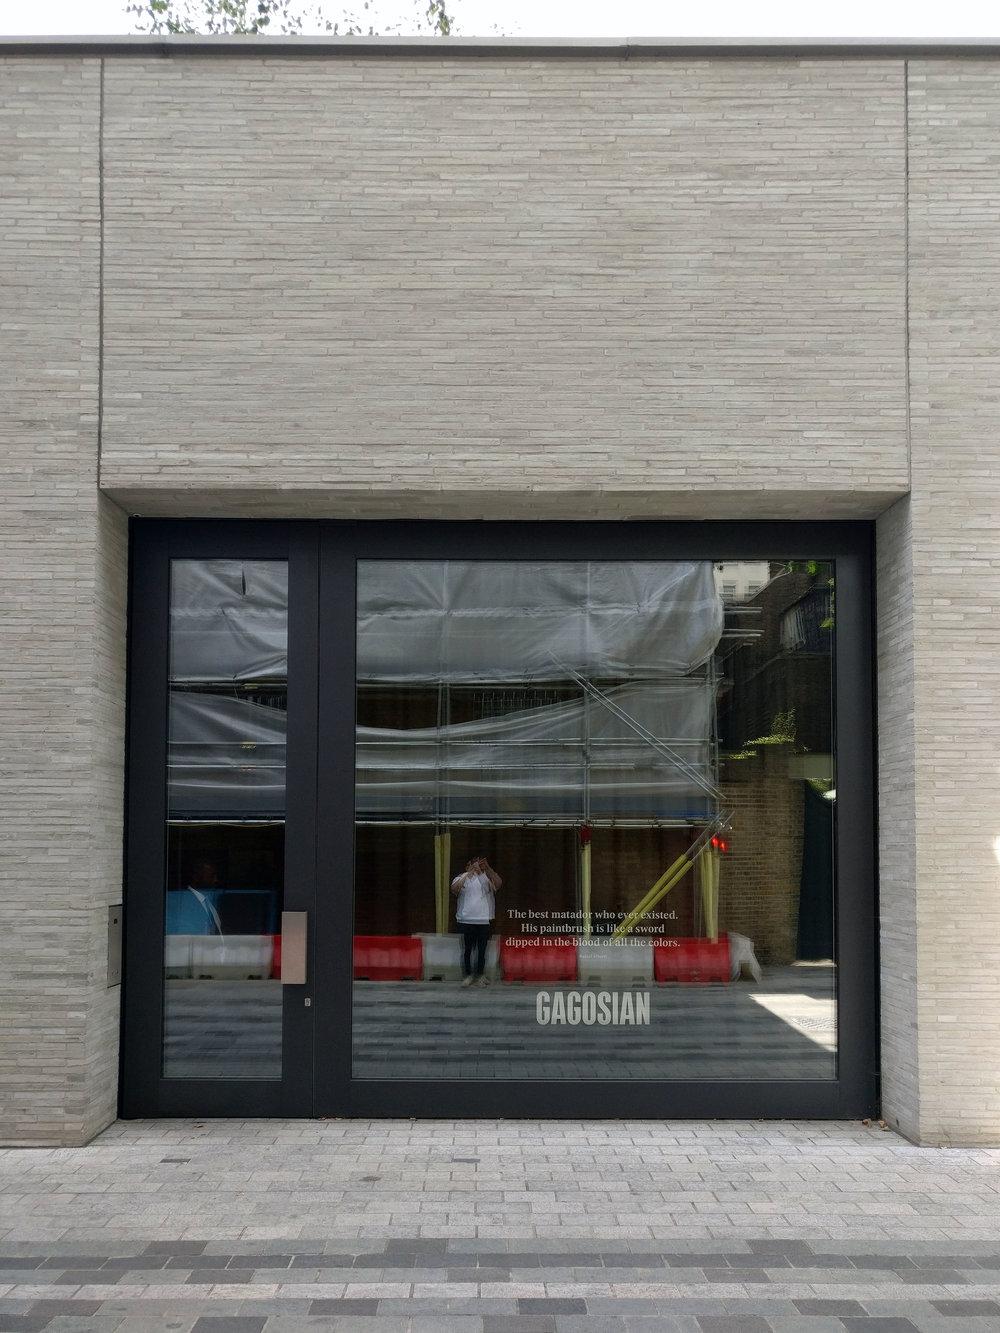 Caruso St. John, Gagosian Gallery, London